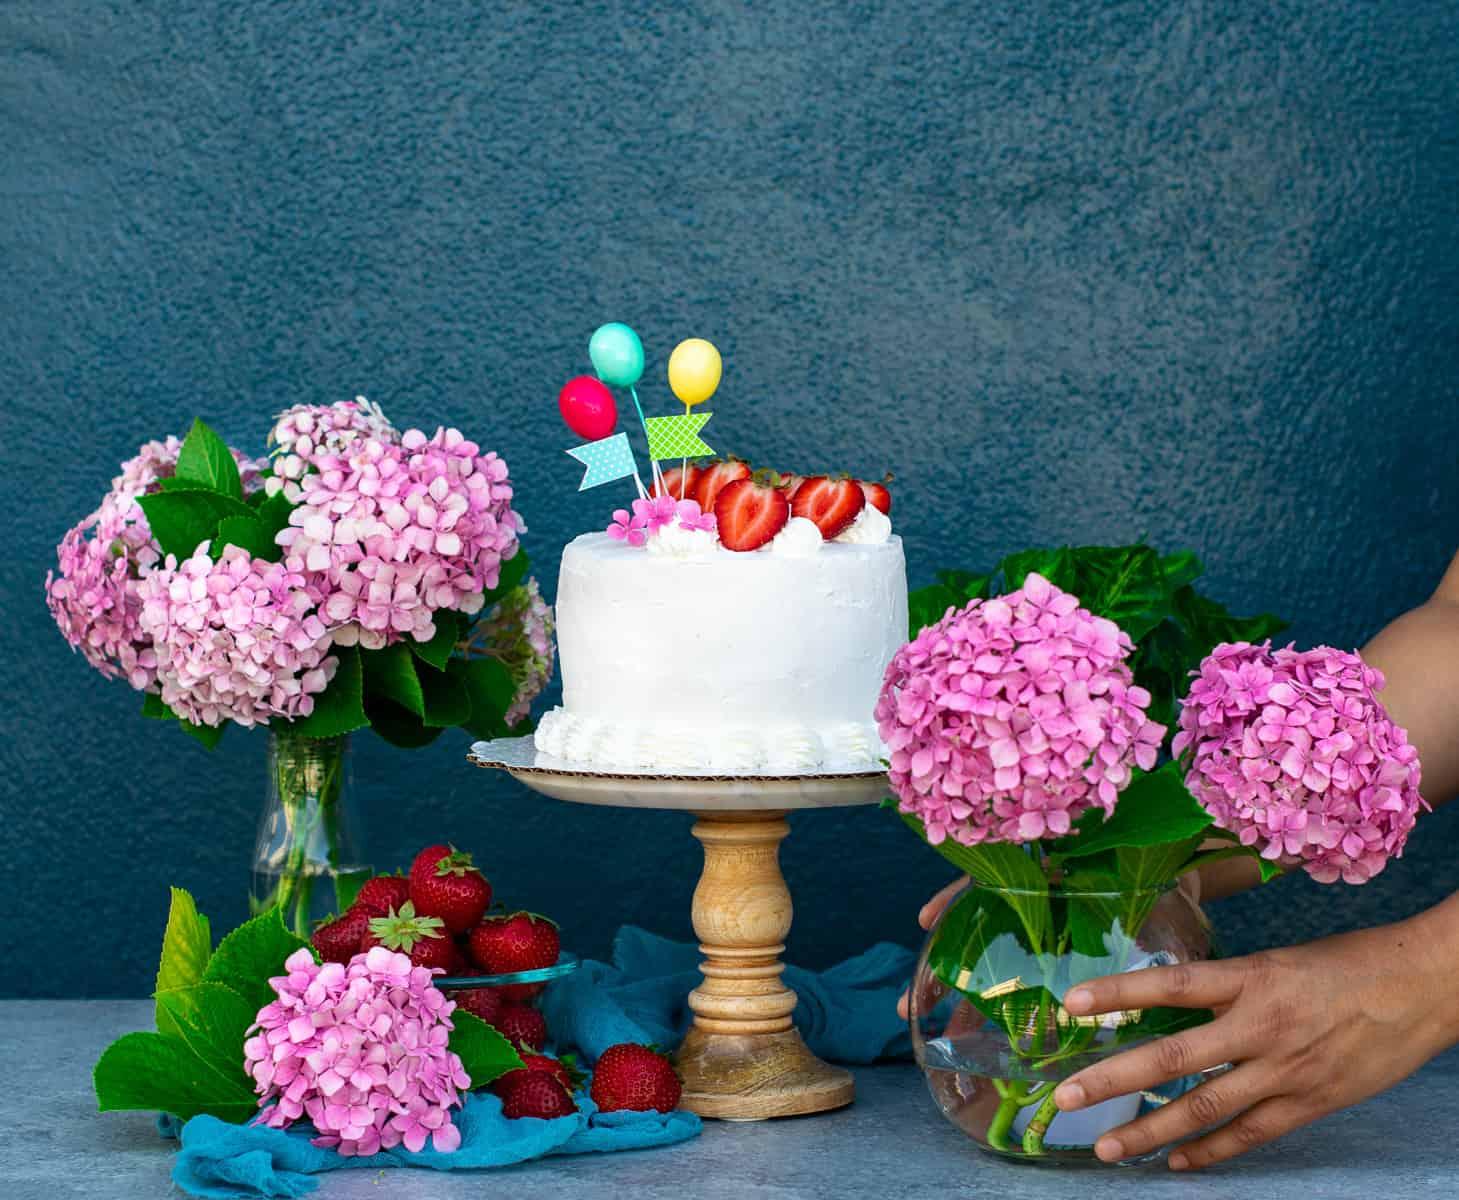 Placing flower vase besides the cake